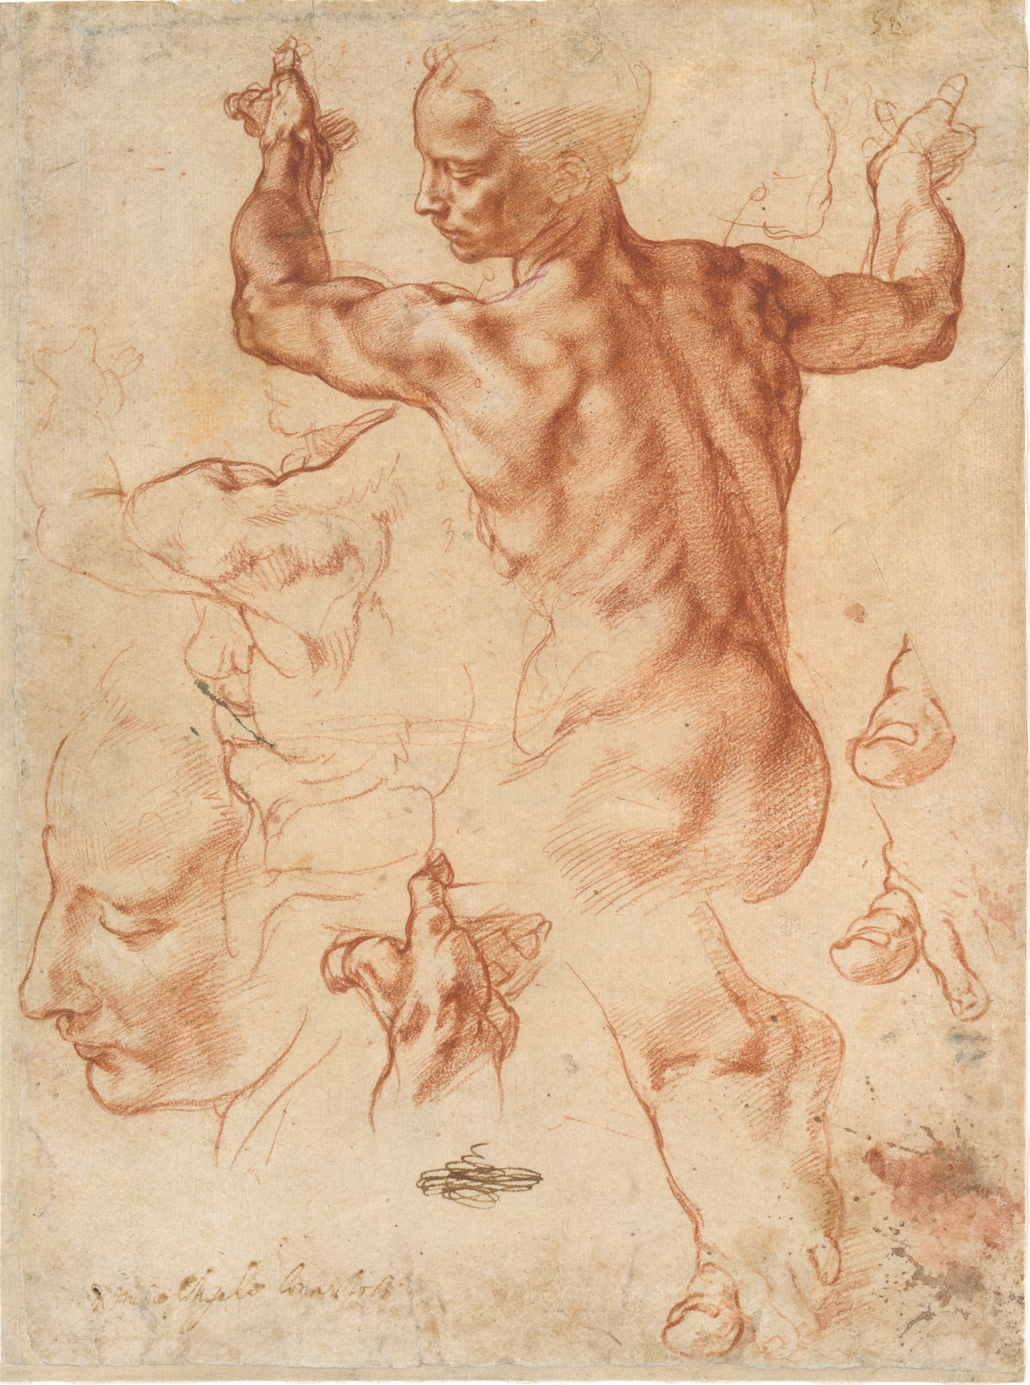 Michelangelo-5.jpg